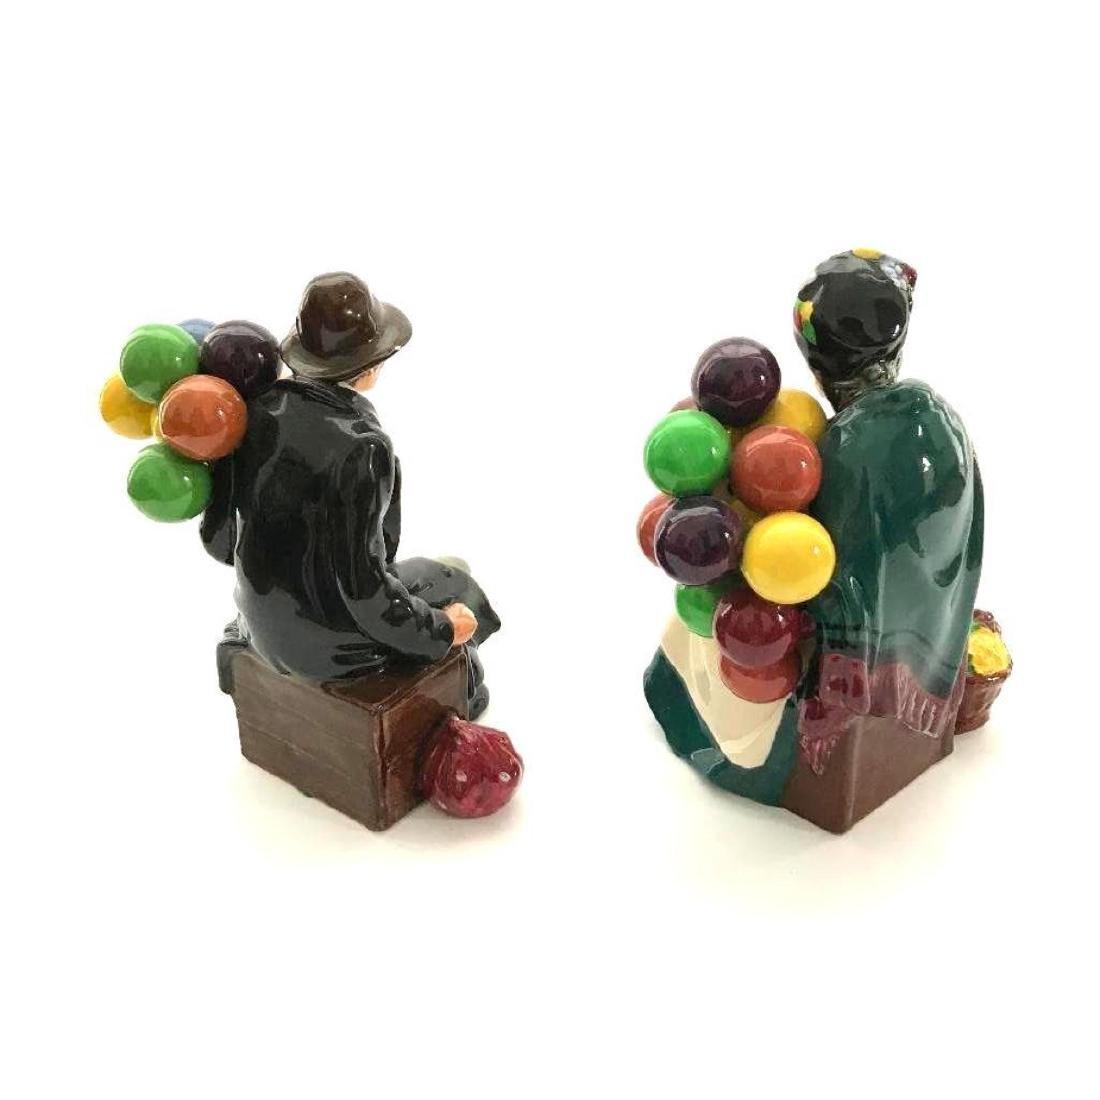 Pair of Retired Royal Doulton Balloon Sellers Porcelain - 5